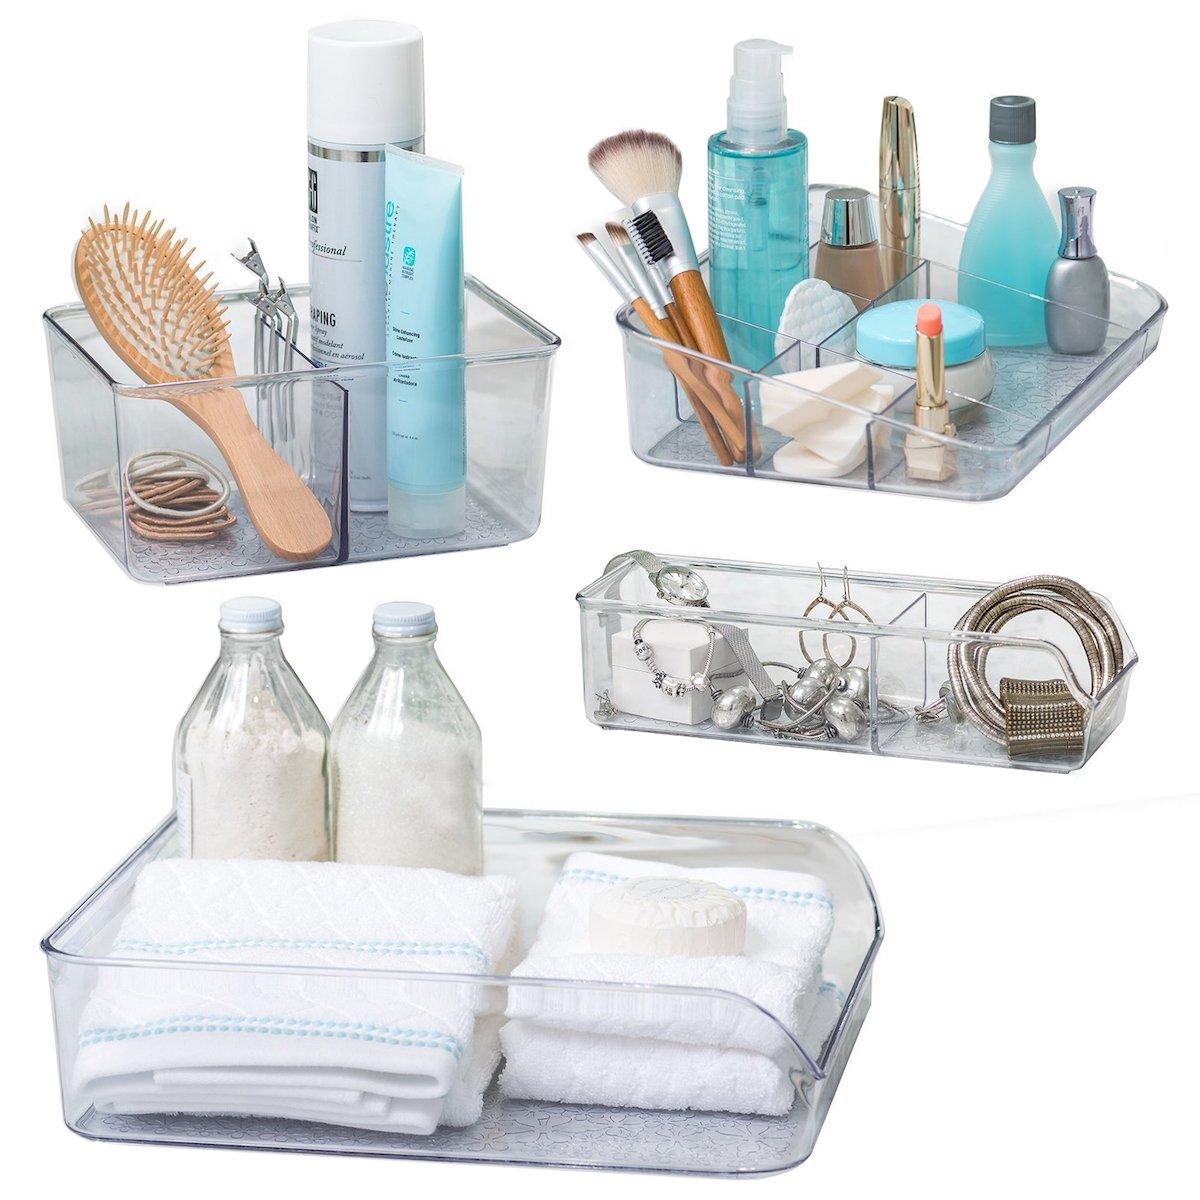 Better Living Set of 4 Vanity Trays for Bathroom Storage Cosmetic Organizers Towel Basket Makeup